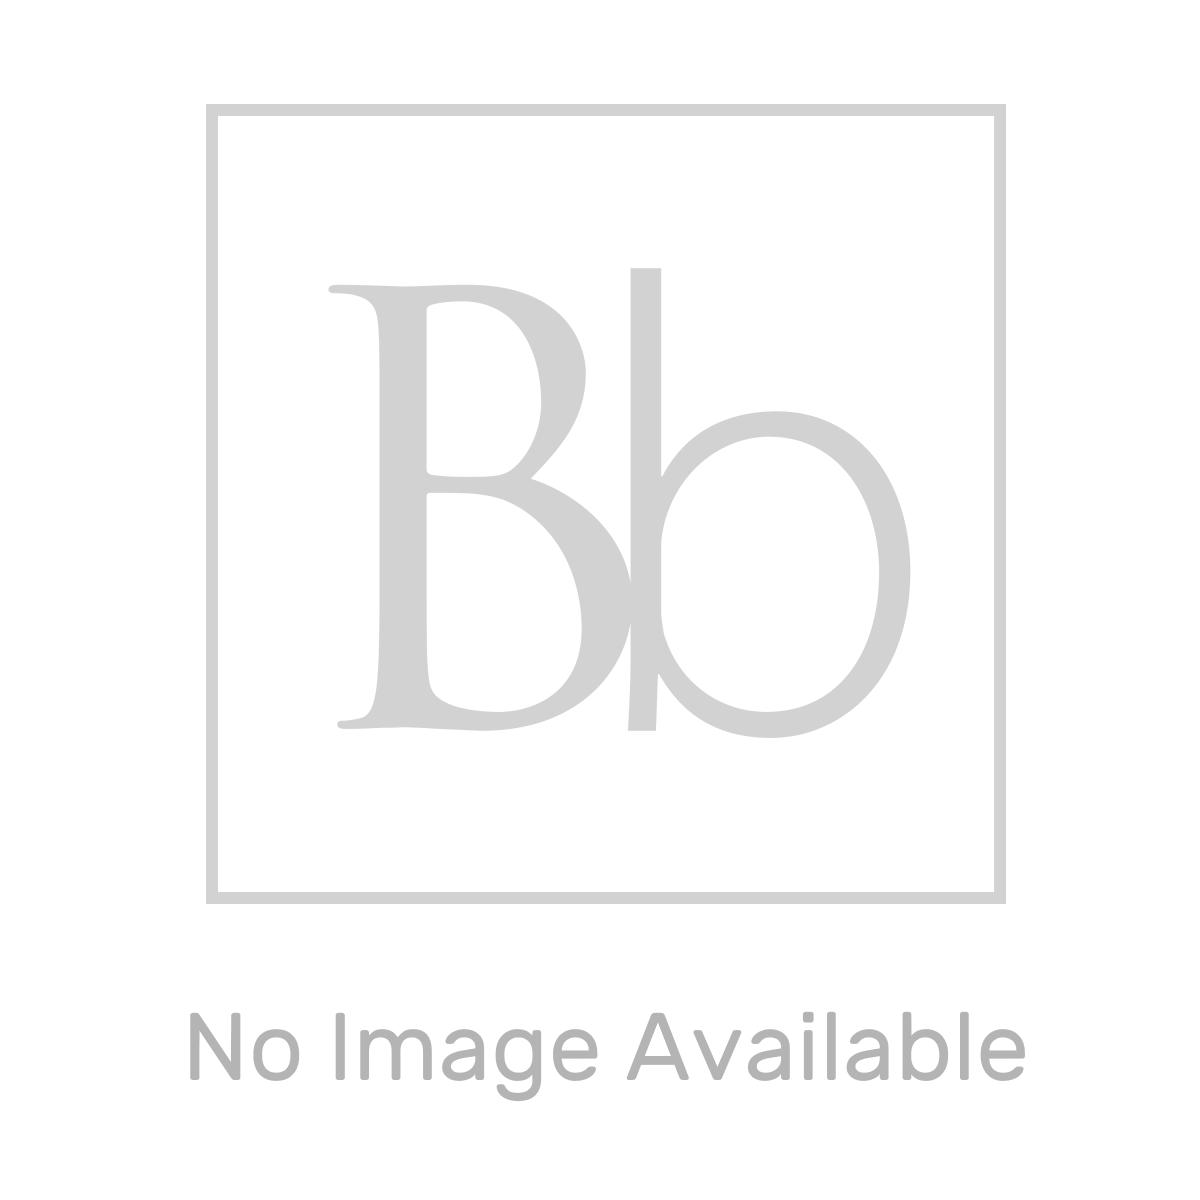 RAK Obelisk Ecofix White Cistern Bidet Cabinet Measurements